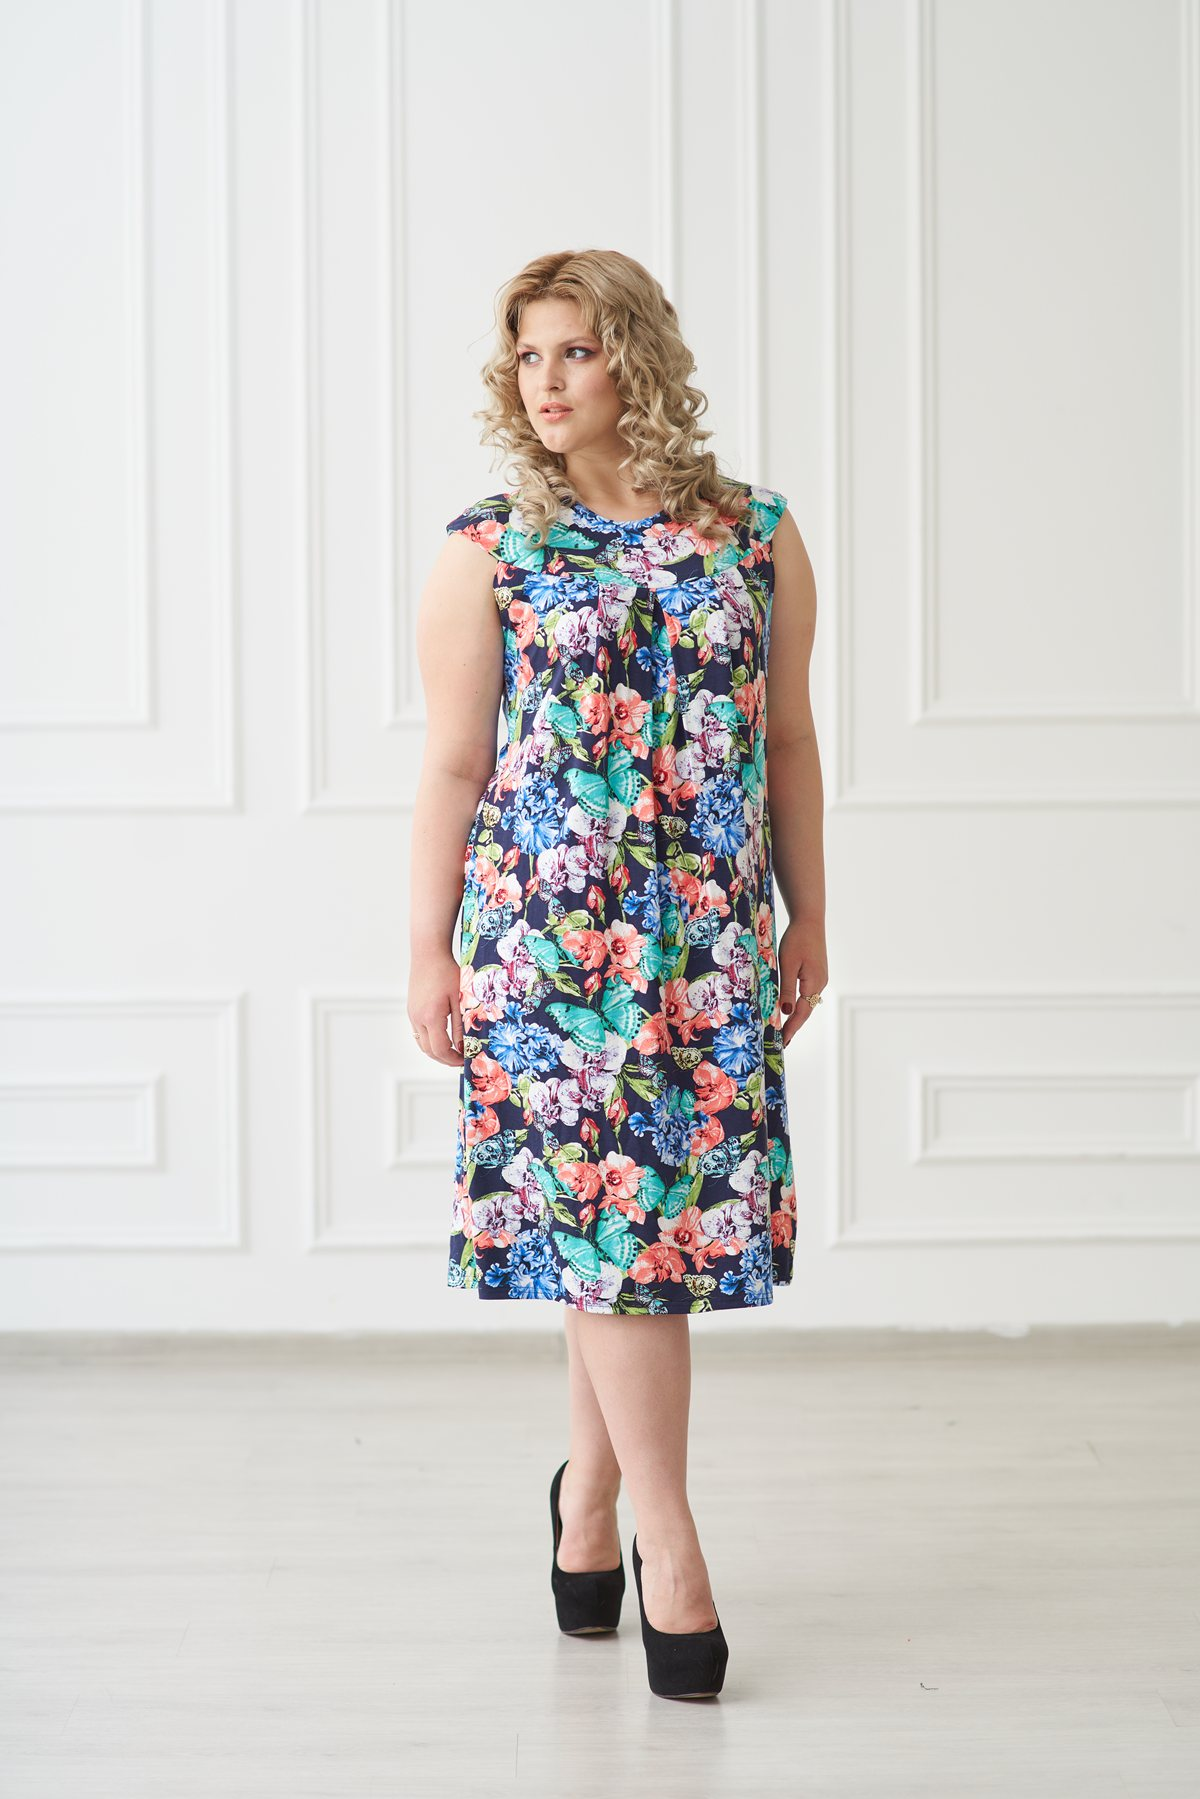 Жен. платье арт. 19-0138 Бабочки р. 46Платья<br>Факт. ОГ: 88 см <br>Факт. ОТ: 88 см <br>Факт. ОБ: 104 см <br>Длина по спинке: 94 см<br><br>Тип: Жен. платье<br>Размер: 46<br>Материал: Вискоза